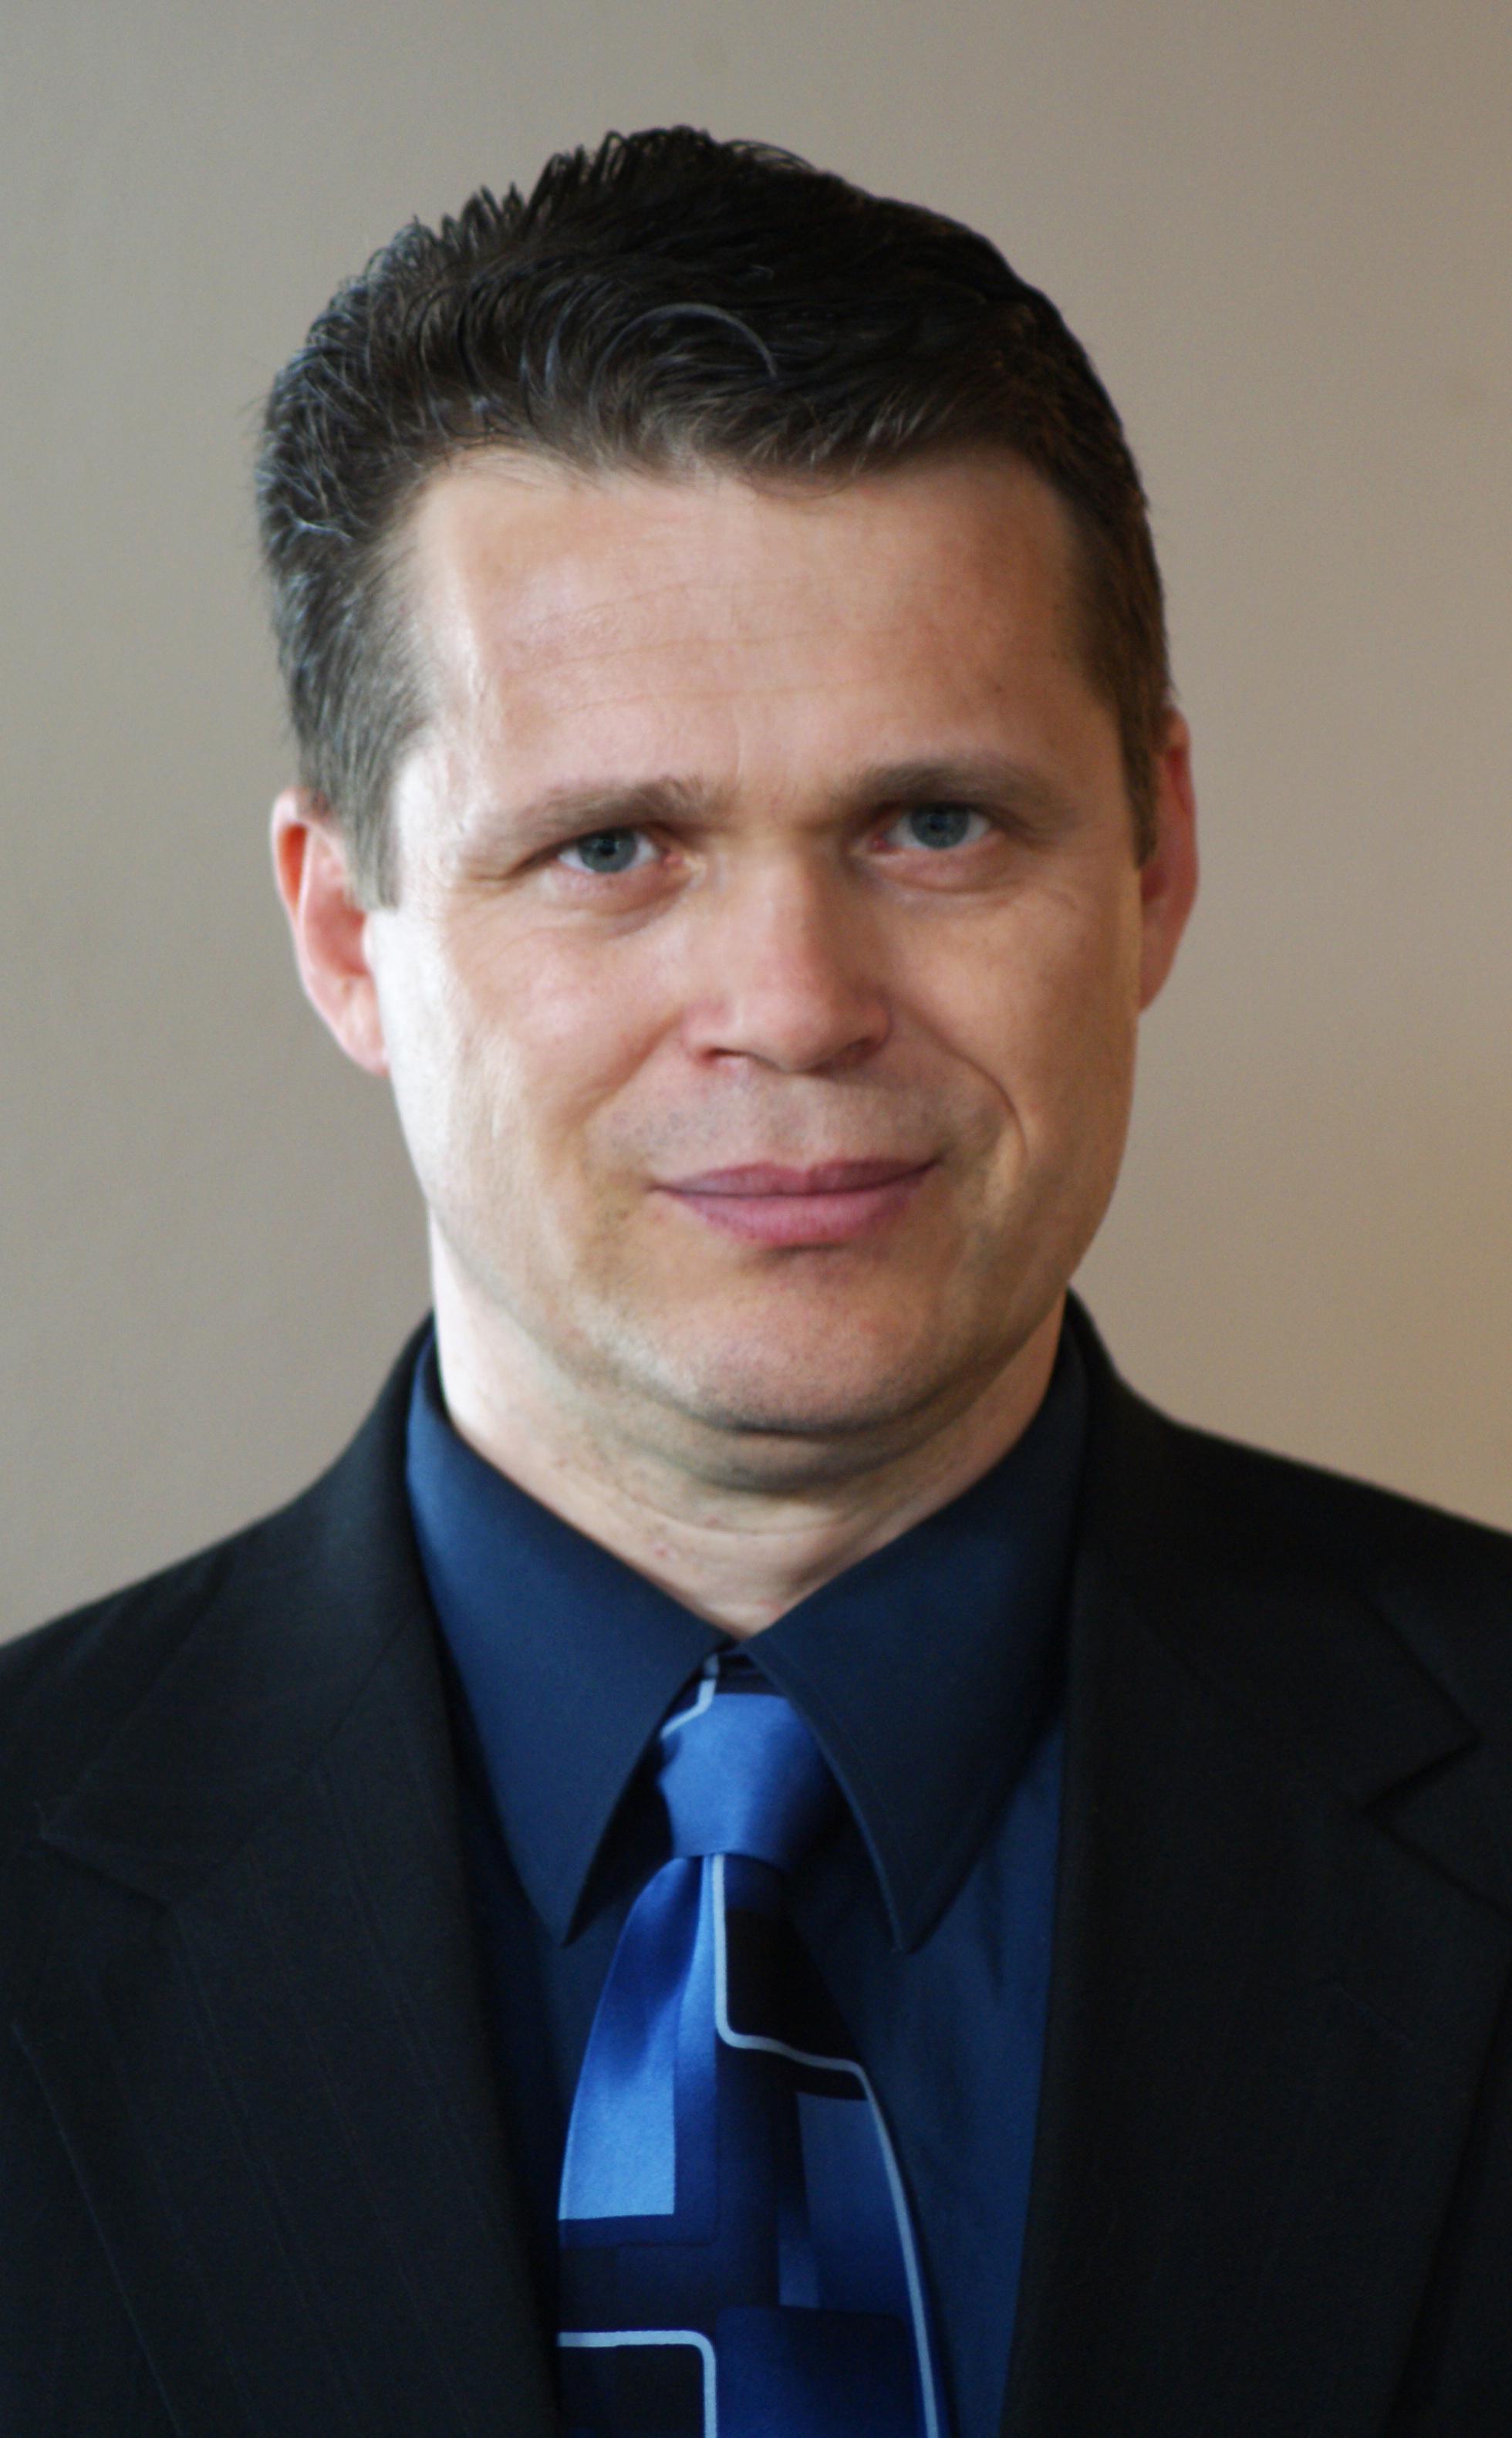 Yurek Hinz